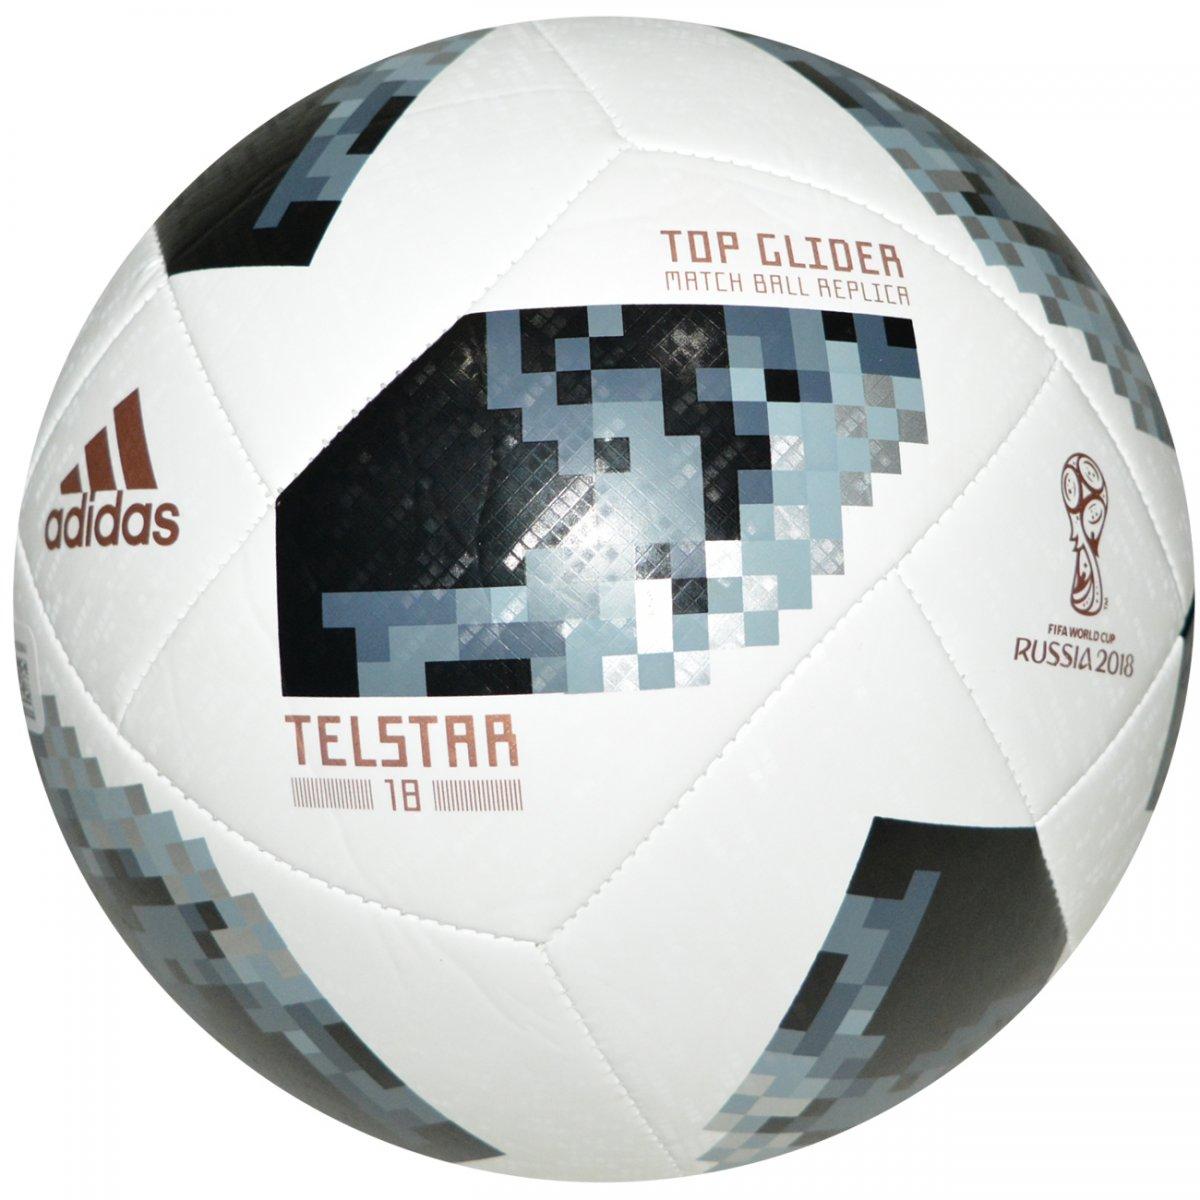 69d73e8b78 Bola Adidas Copa da Russia 2018 CE8096 - Branco preto - Chuteira Nike